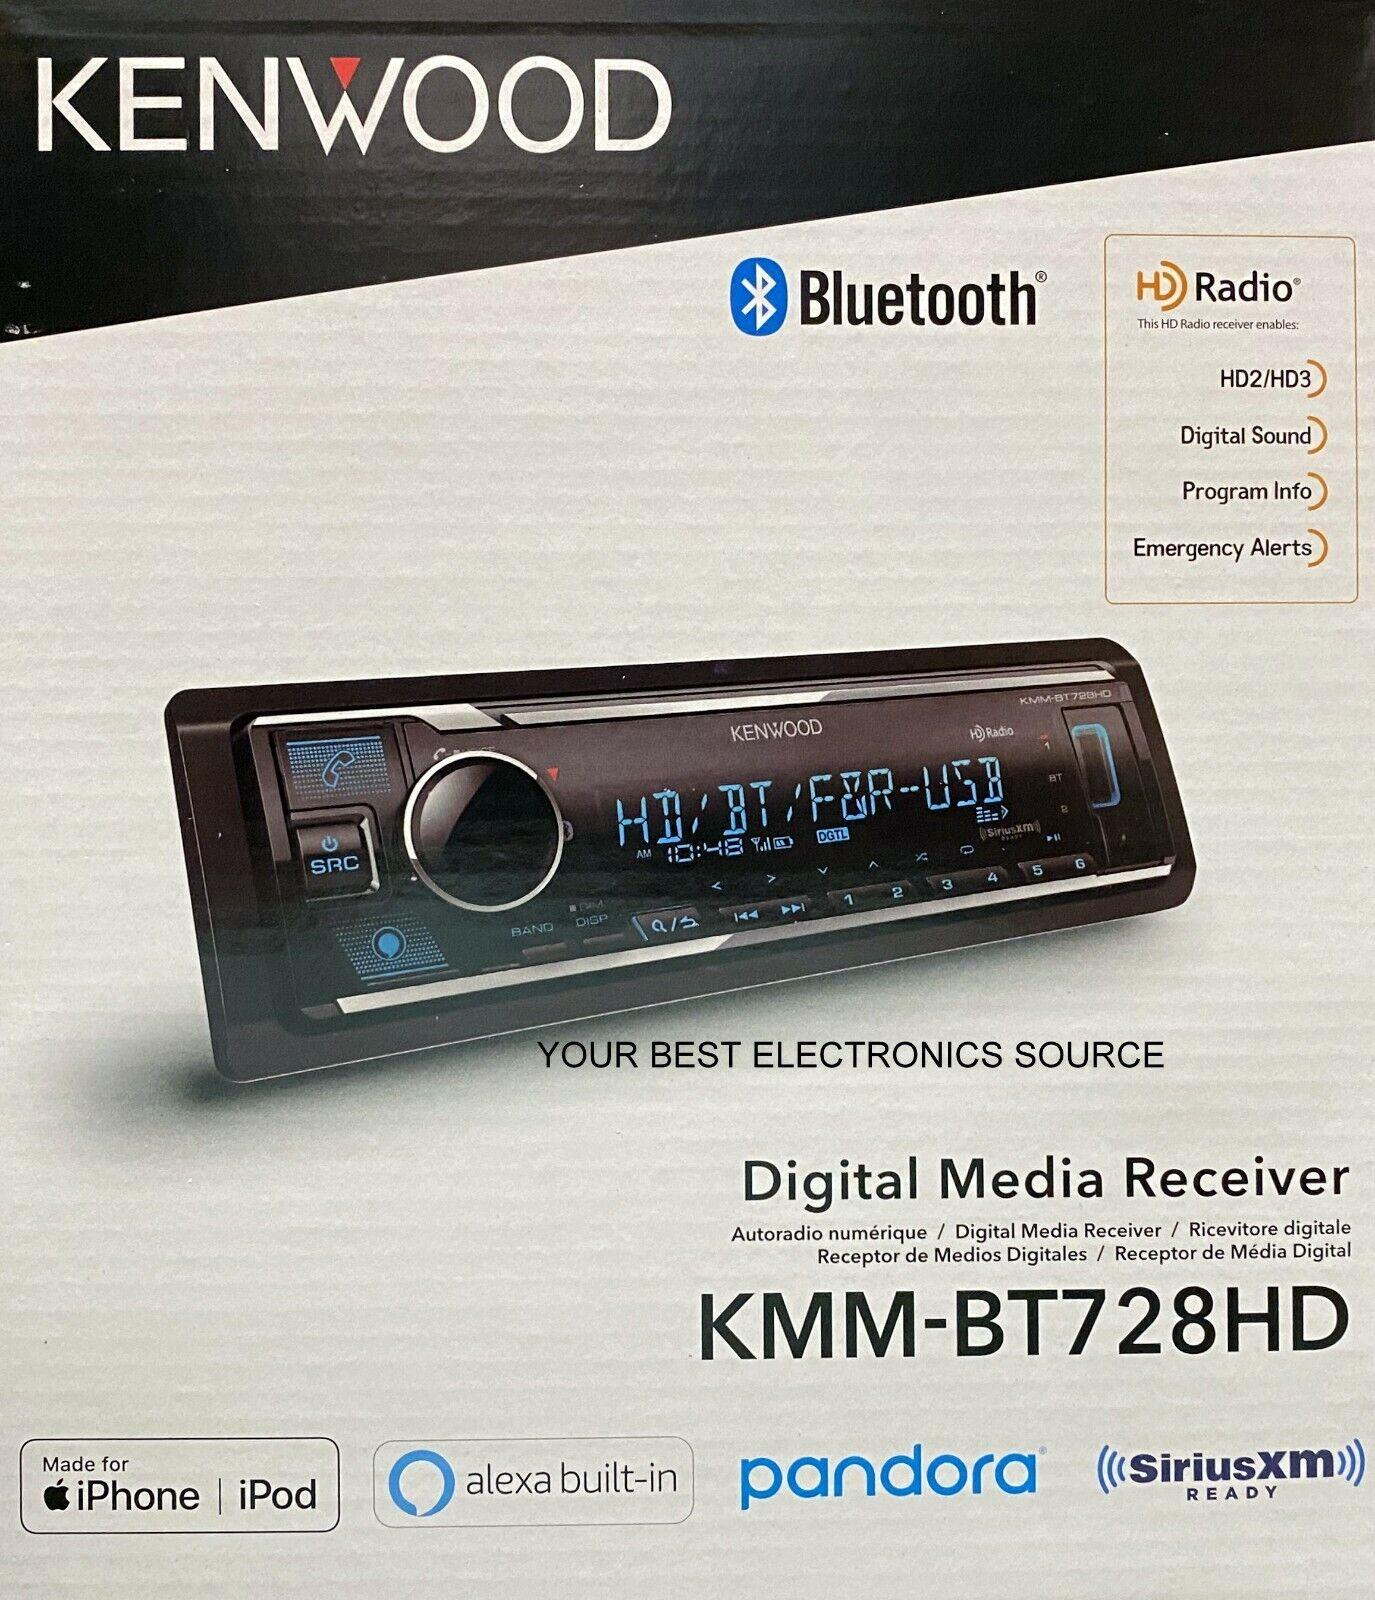 Kenwood KMM-BT728HD Bluetooth Digital Media Receiver Support